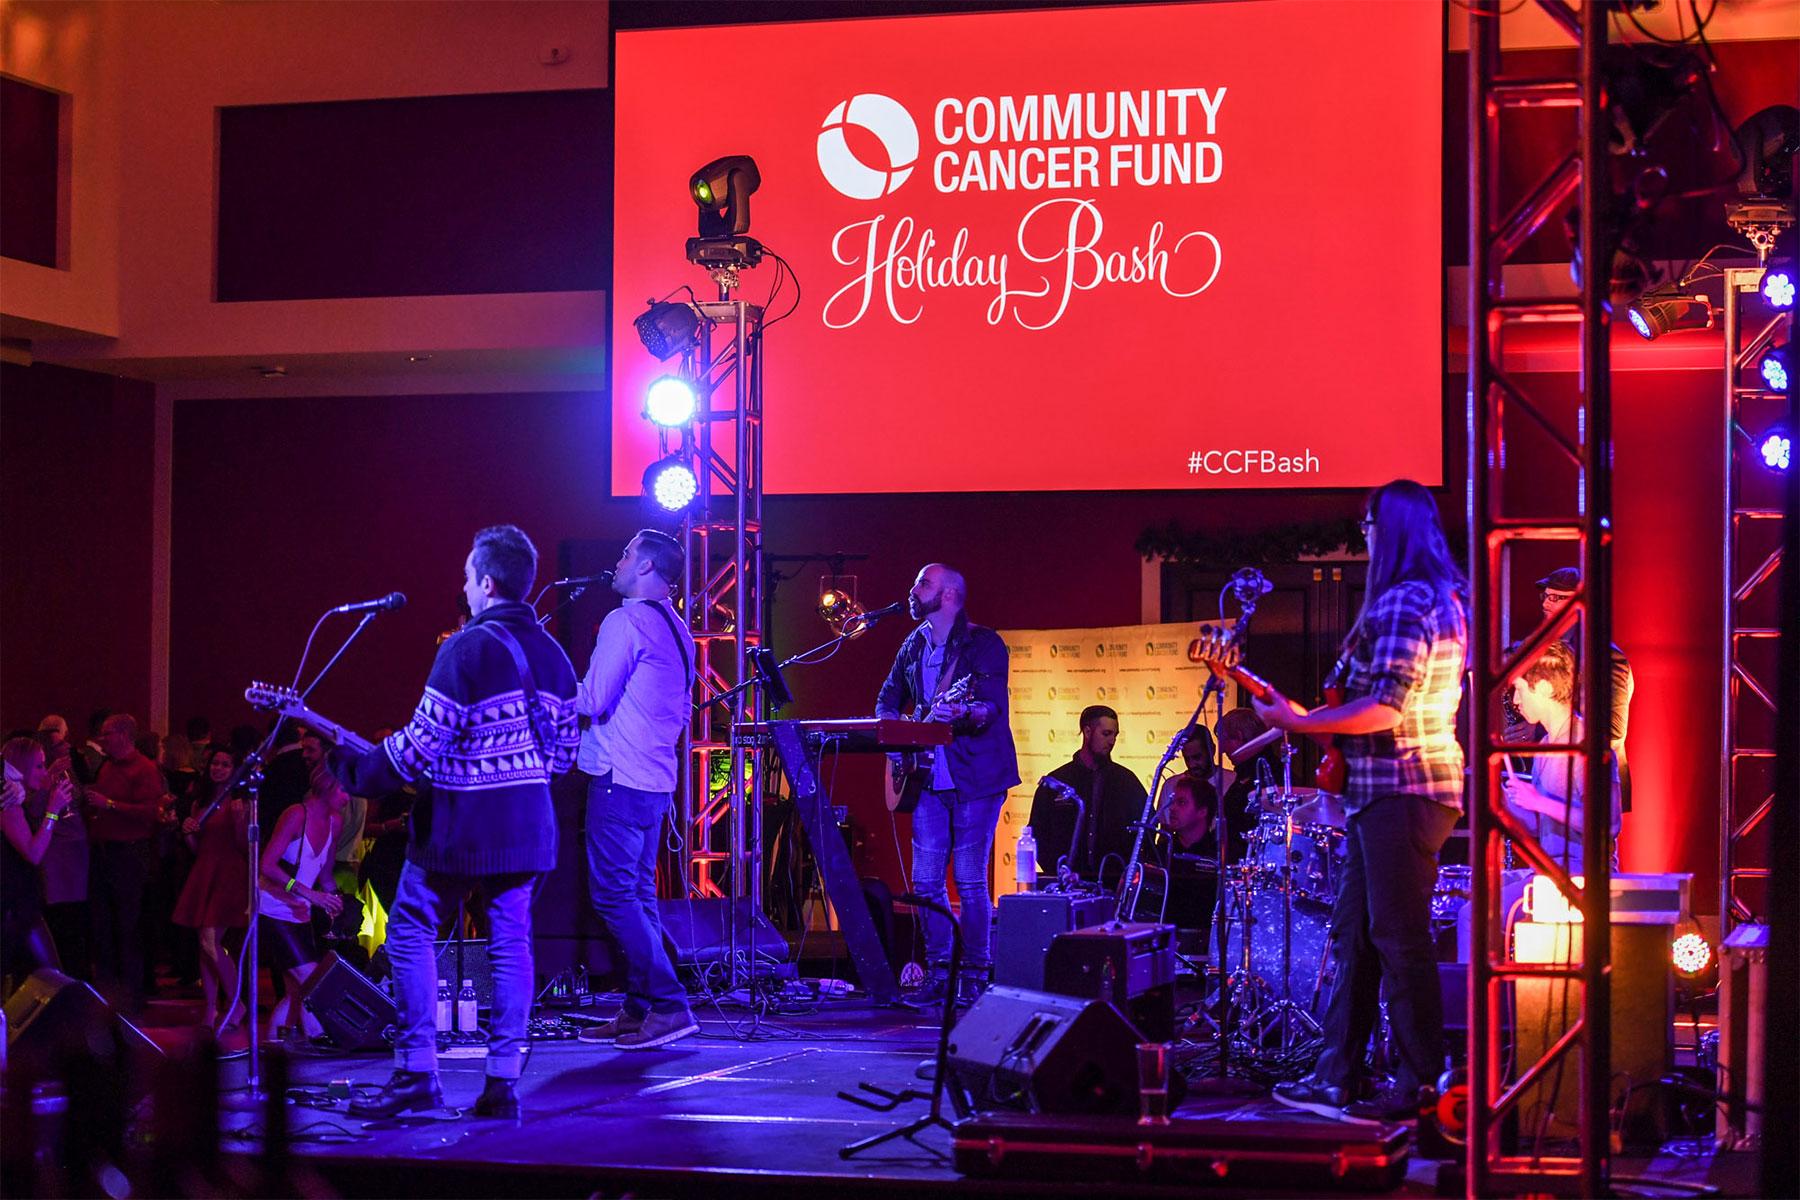 Community Cancer Fund Holiday Bash 2016